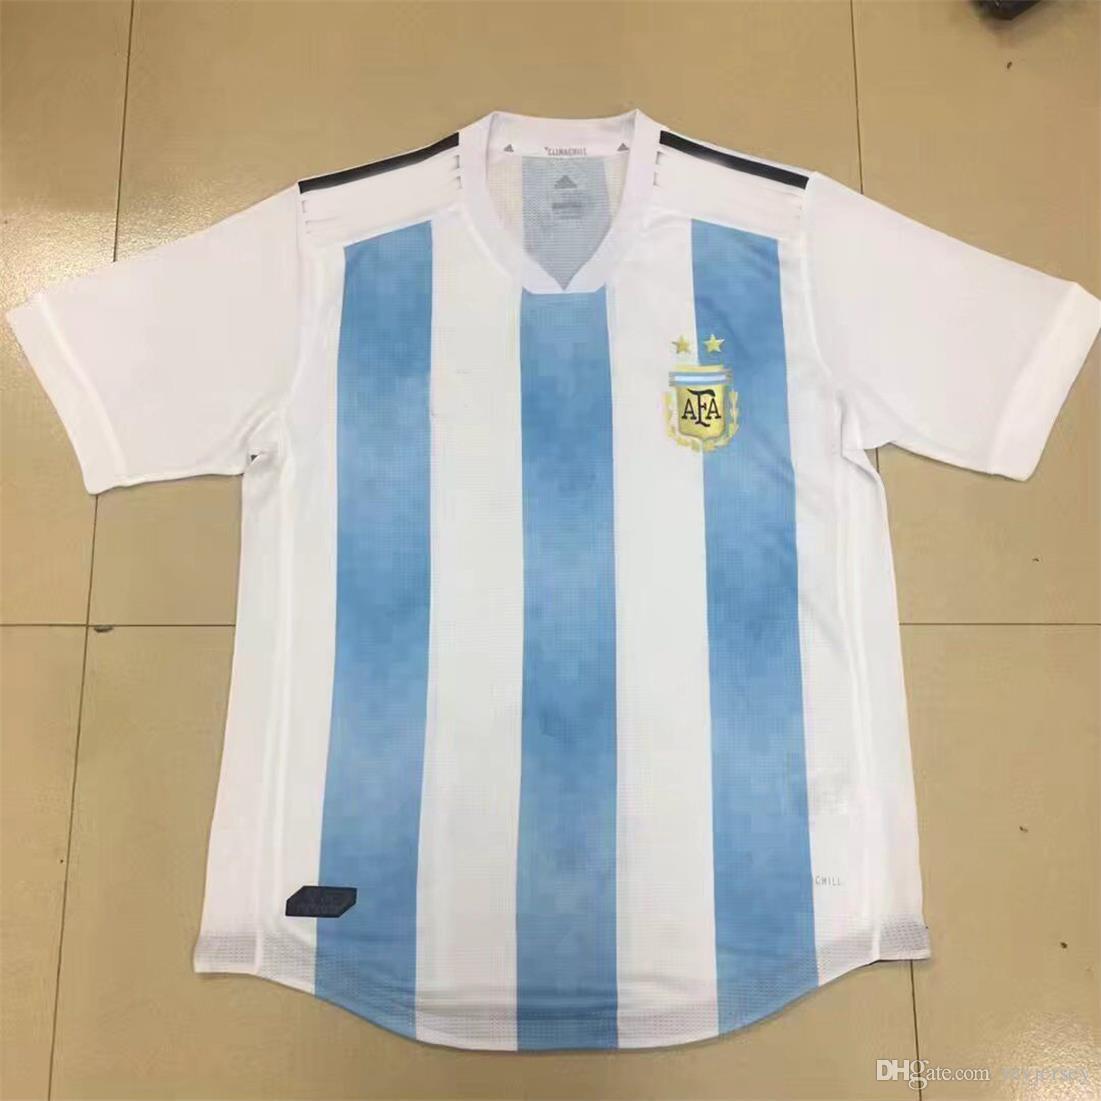 a14784d9b87 2019 Player Version 2018 Argentina Soccer Jerseys Size S XXXL MESSI Jersey World  Cup Aguero Di Maria MARADONA HIGUAIN Maillot De Futol Camisetas From ...